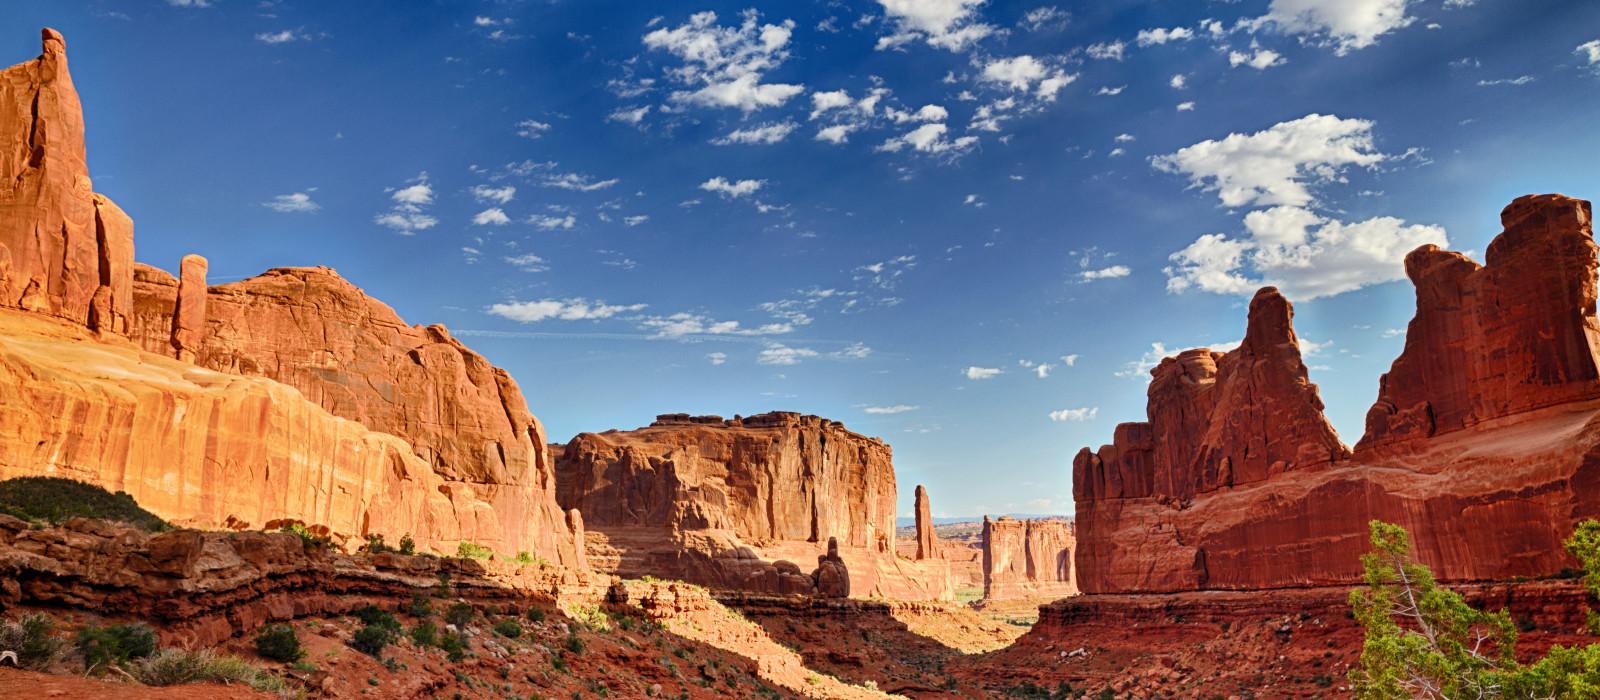 Destination Moab USA